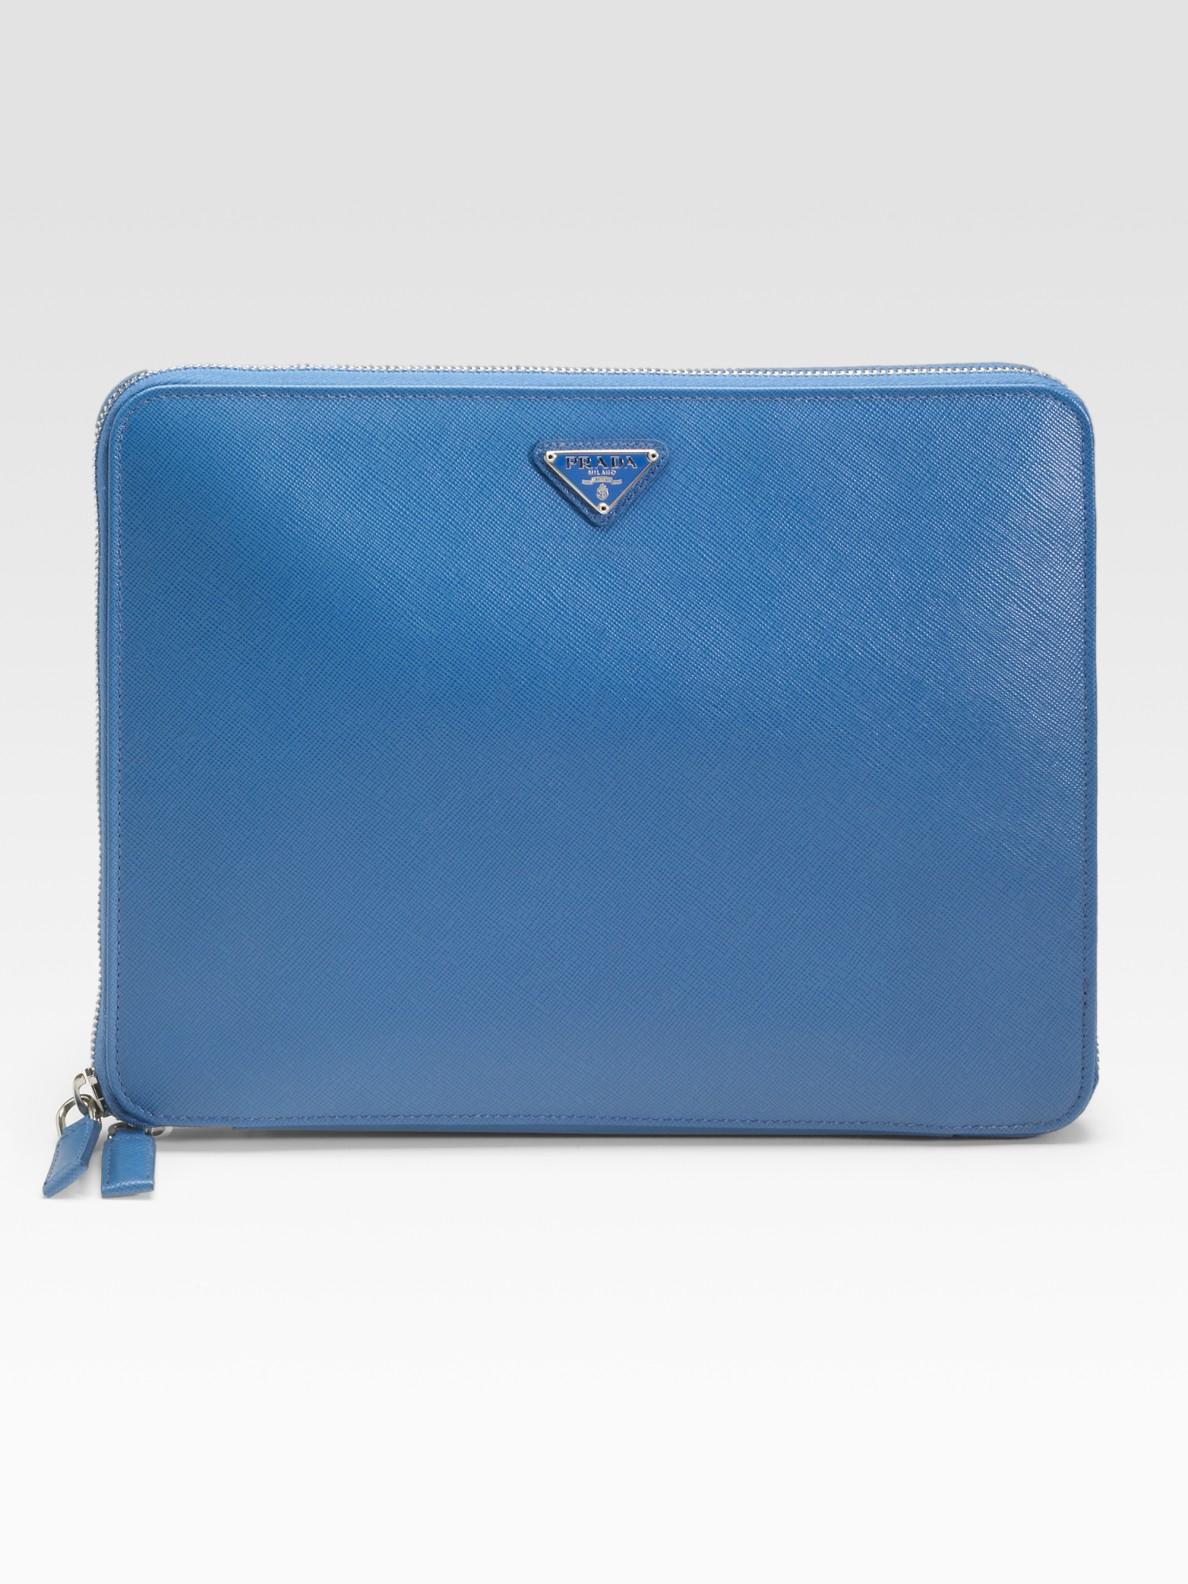 Lyst - Prada Saffiano Travel Case For Ipad in Blue for Men